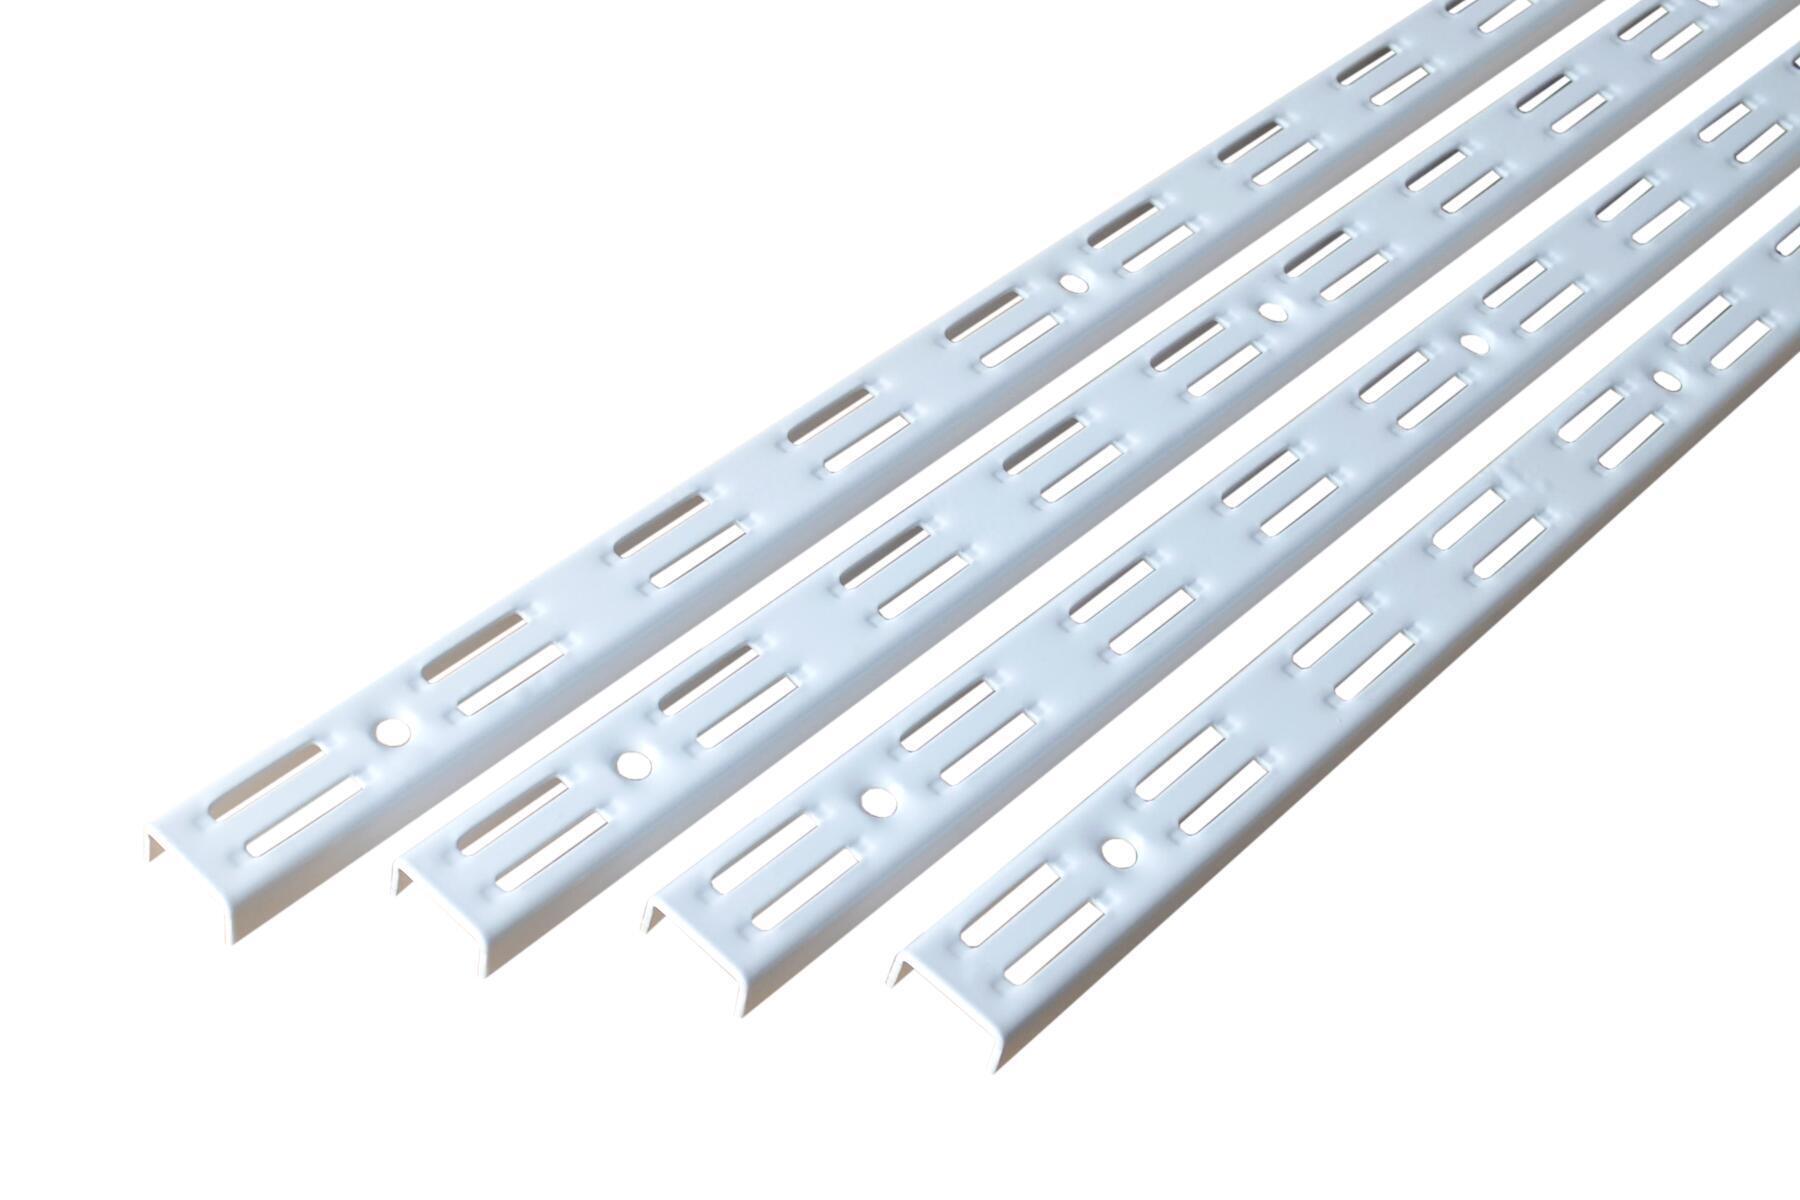 Cremagliera doppia Spaceo H 200 x L 0.62 cm, Sp 1.5 mm bianco - 2